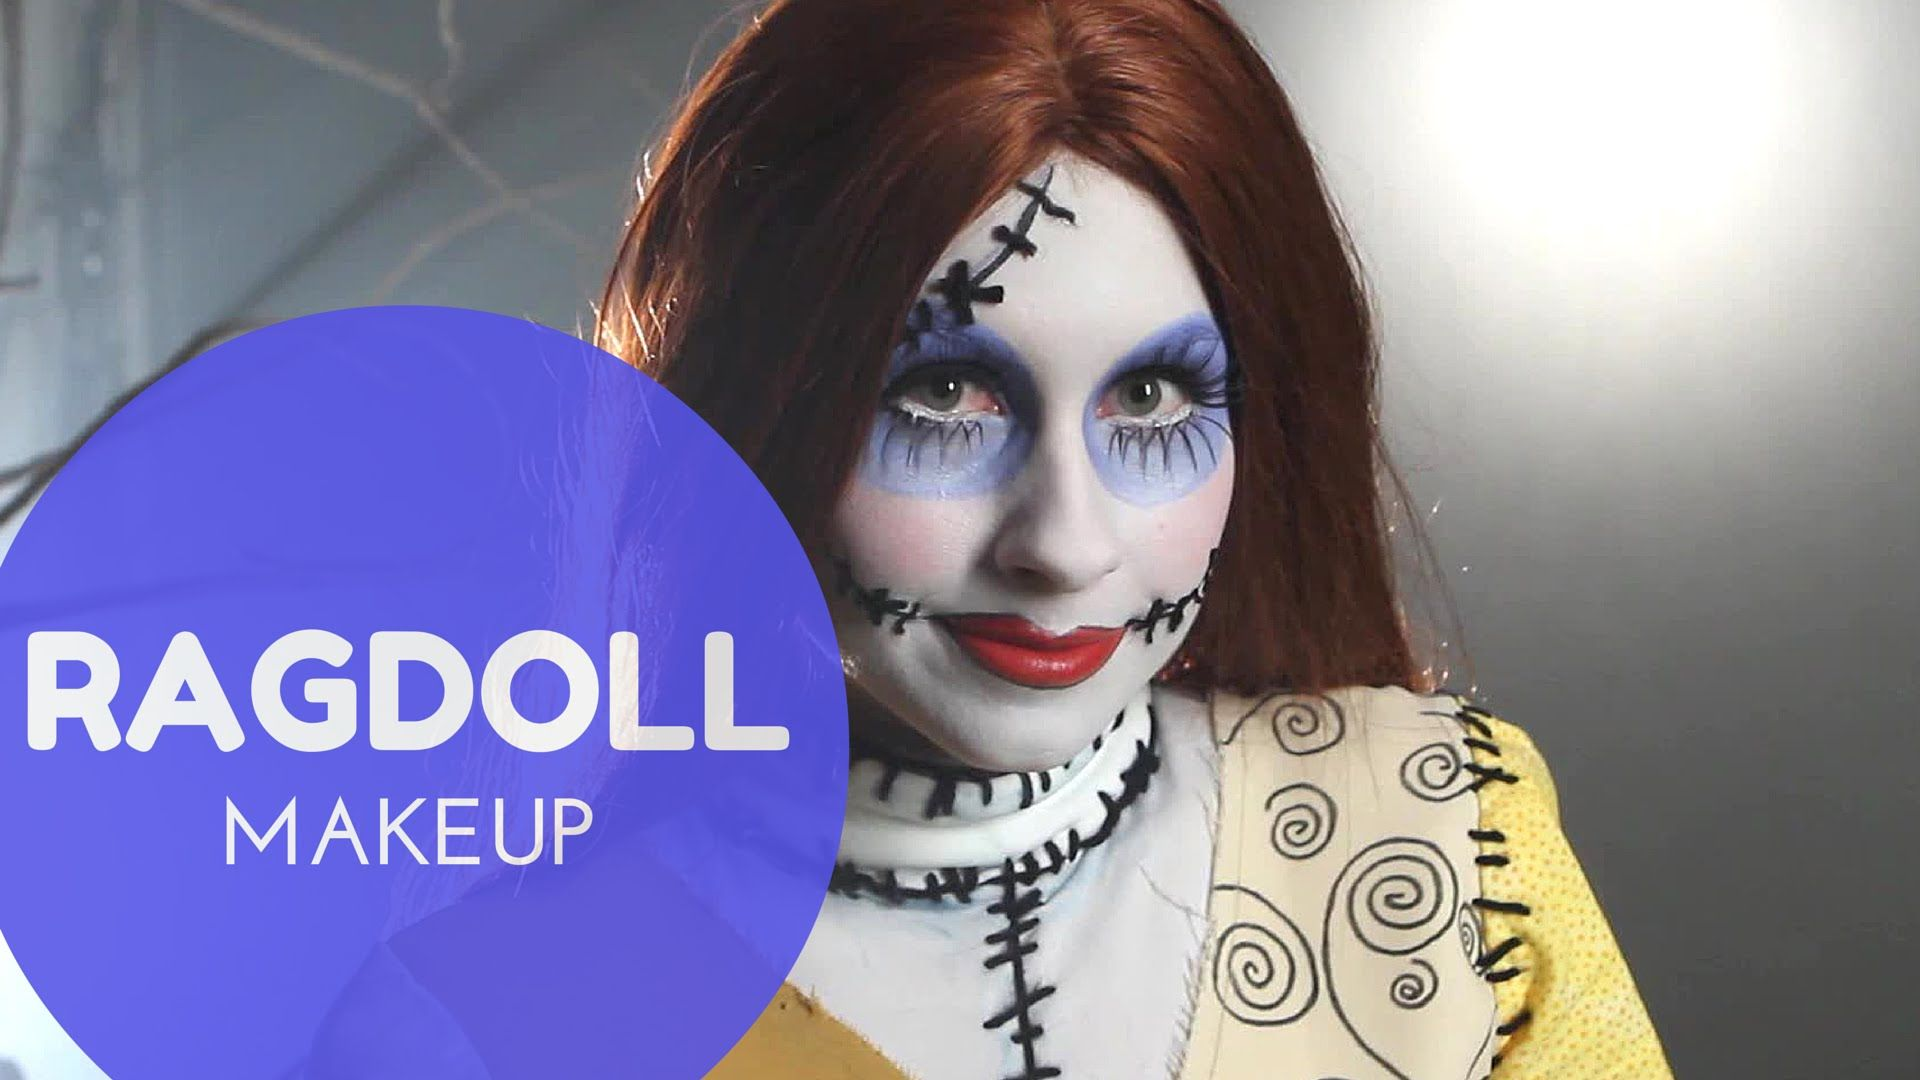 Sally the Ragdoll Nightmare Before Christmas Makeup Tutorial